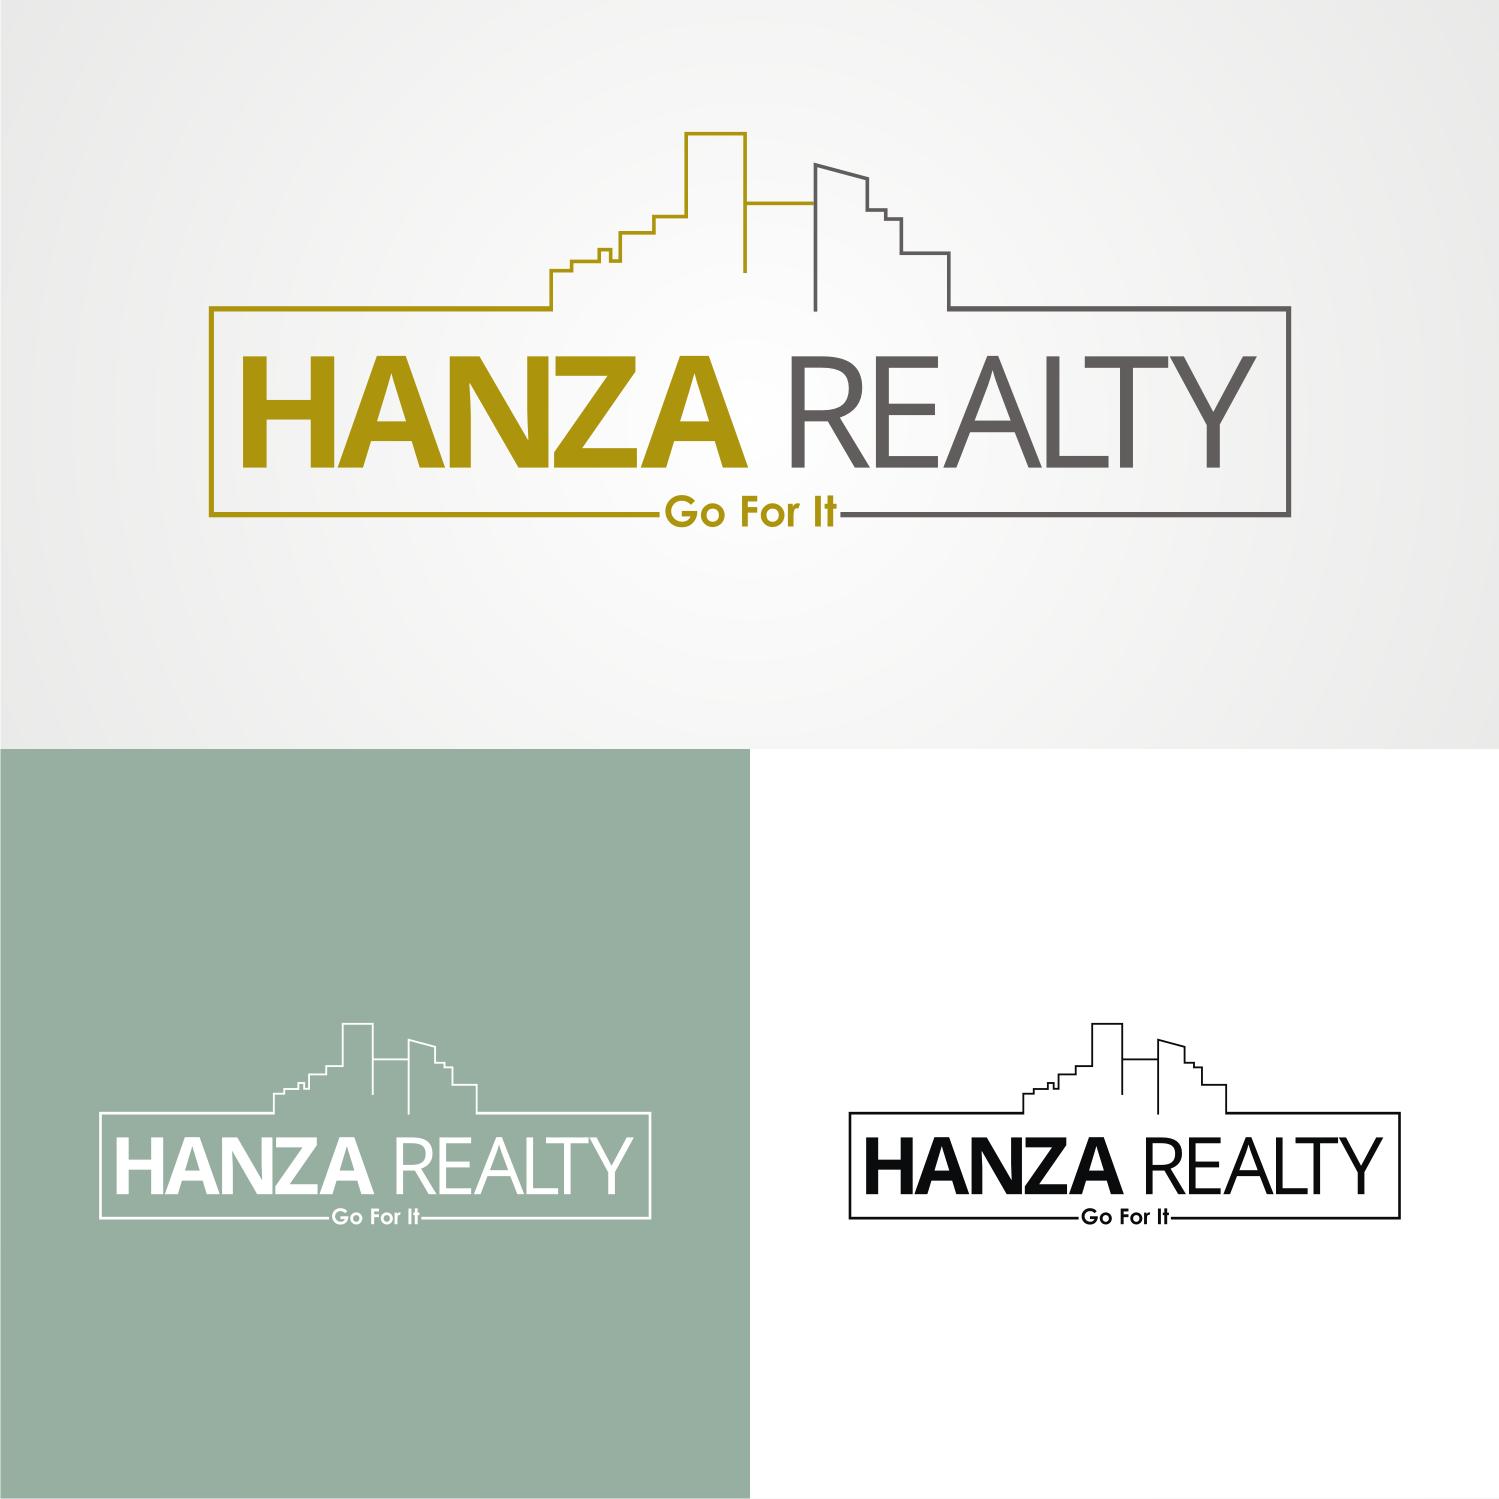 Logo Design by Andri Septianto - Entry No. 372 in the Logo Design Contest Logo Design for Hanza Realty.